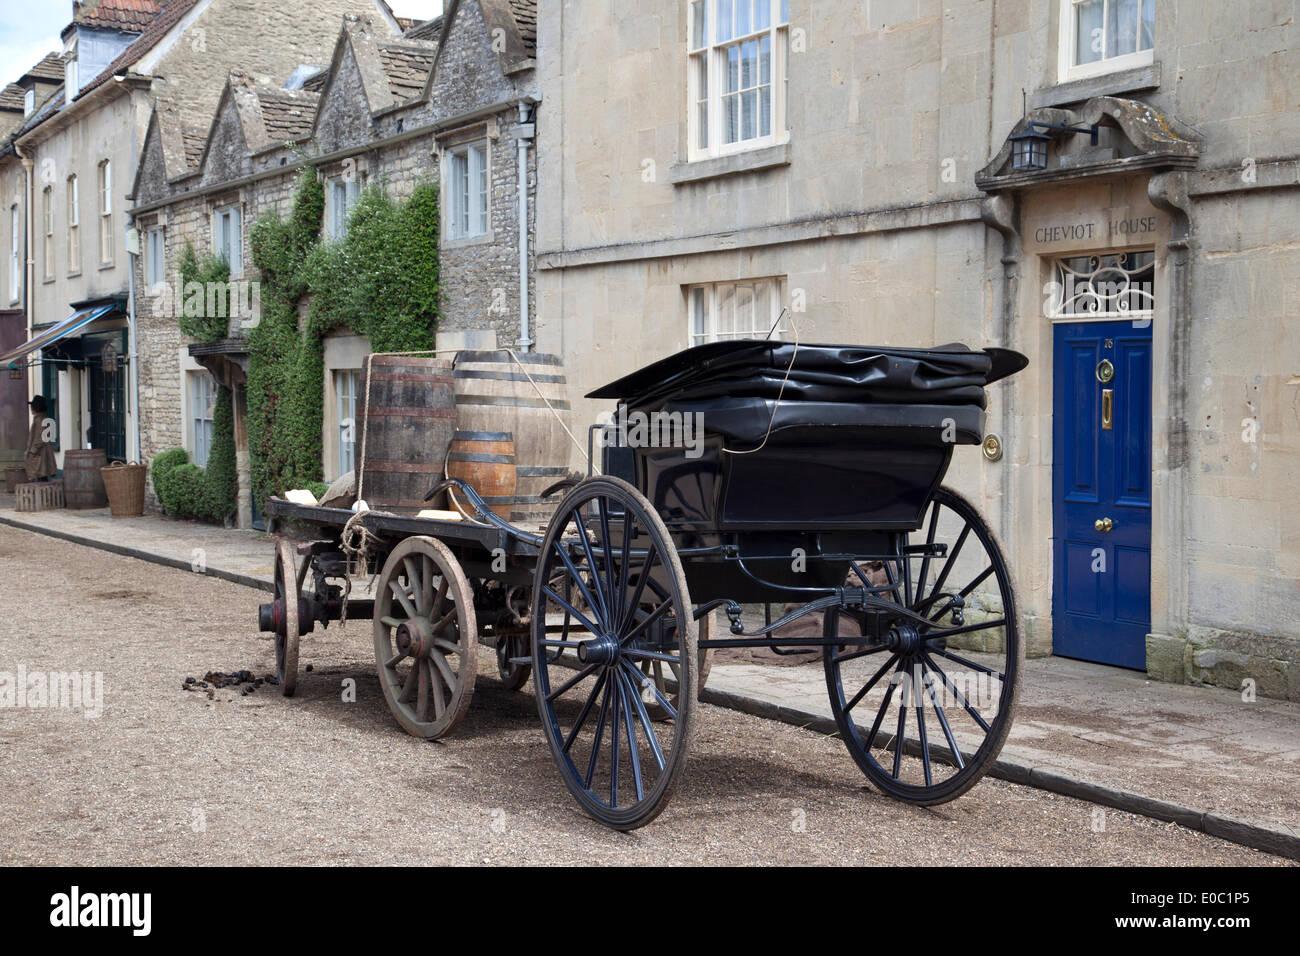 Film Satz der Periode Drama Poldark Corsham, Wiltshire, UK. 7. Mai 2014. Stockfoto